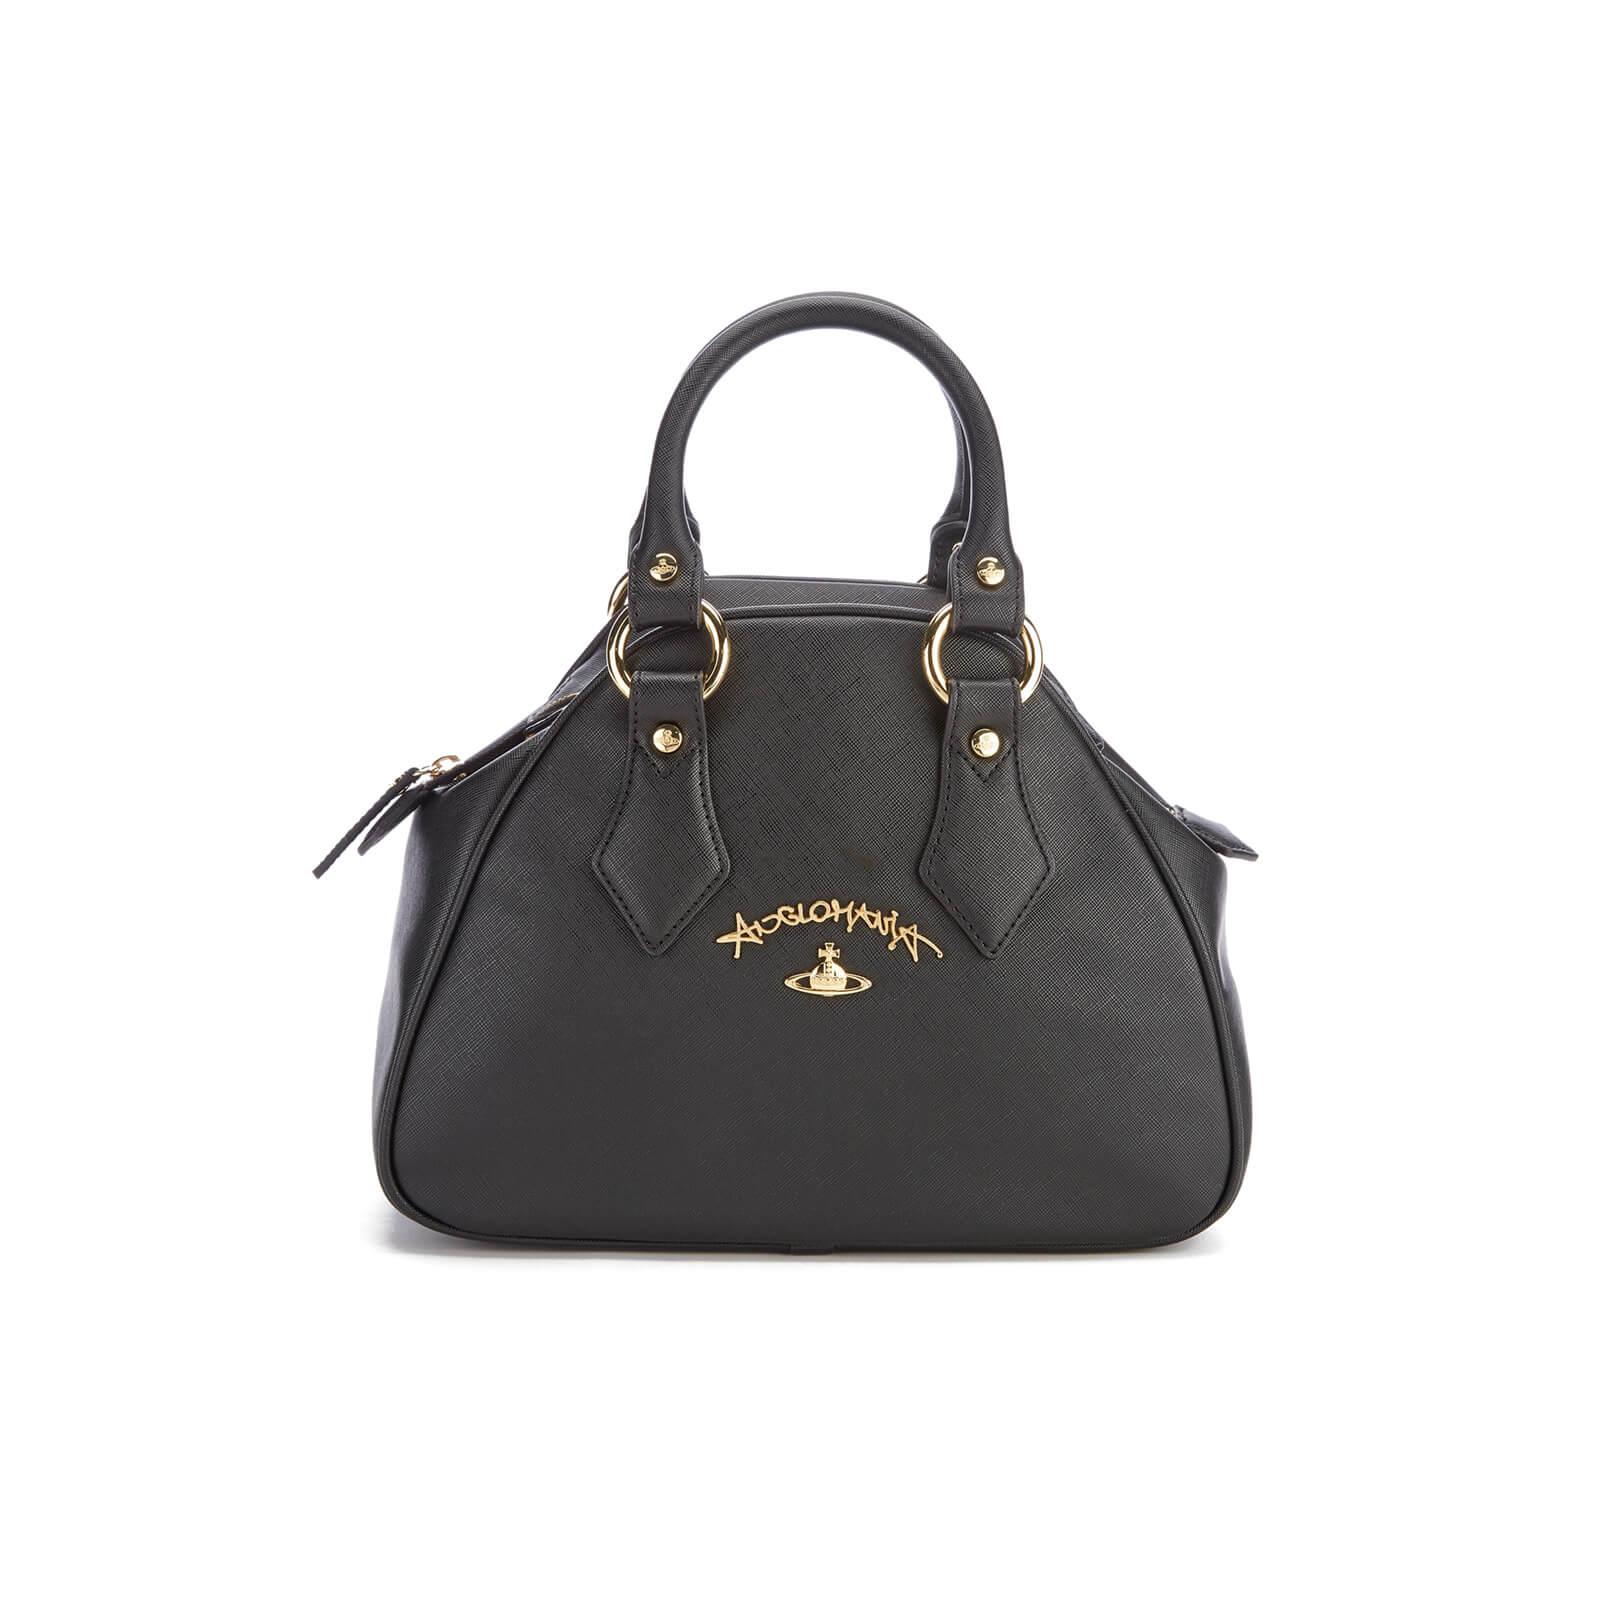 ec2cd43154 Vivienne Westwood Women s Divina Small Tote Bag - Black - Free UK ...